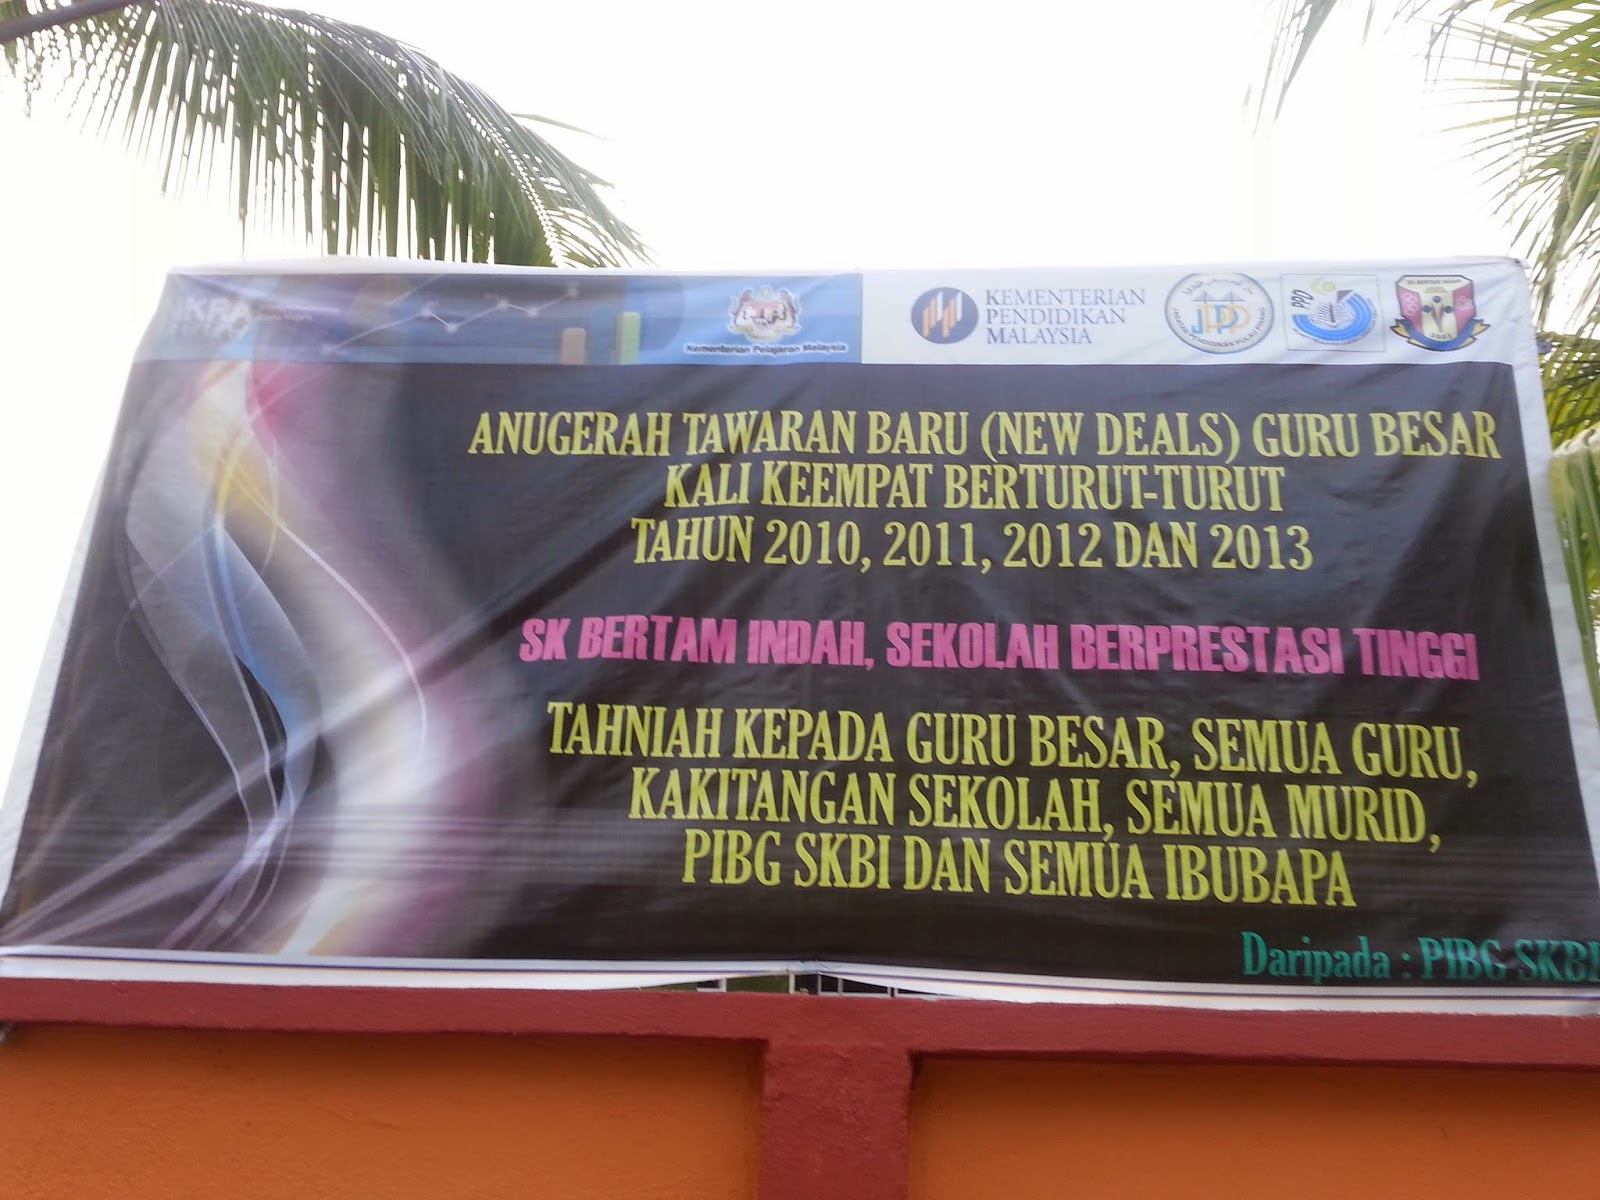 Contoh Sekolah Berprestasi Tinggi SK Bertam Indah Kepala Batas Pulau Pinang